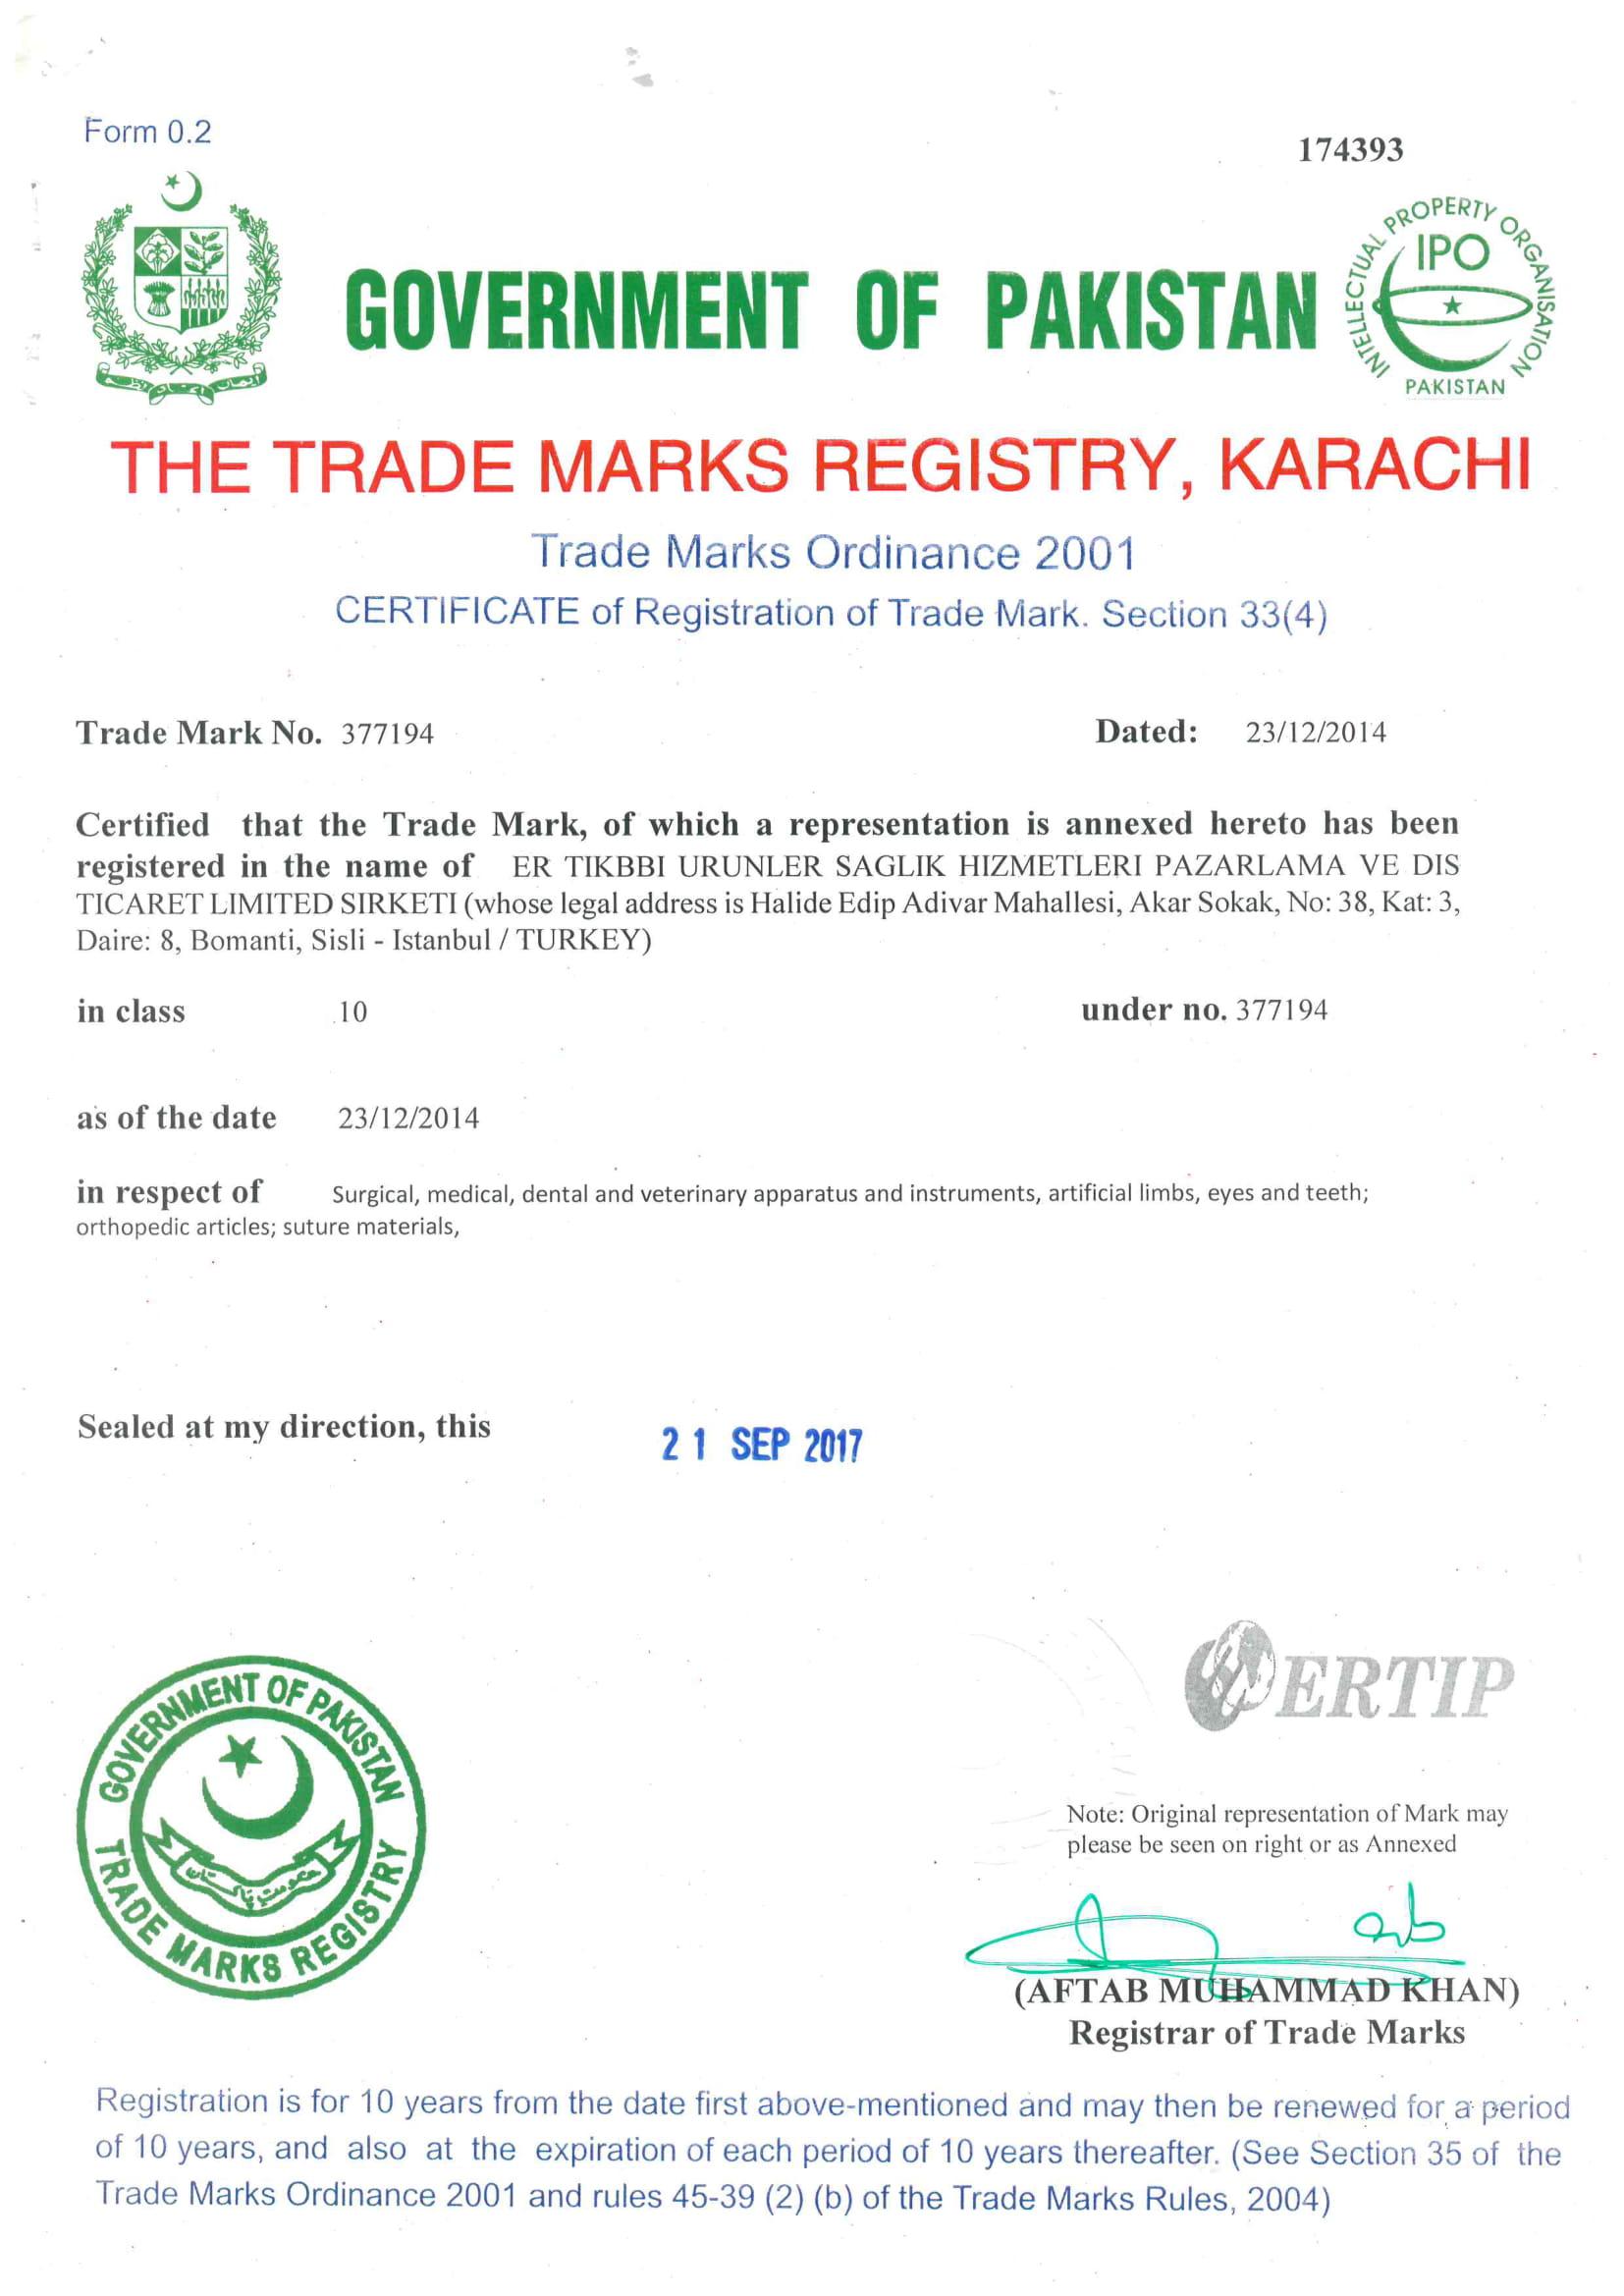 Pakistan Trademark Registration Certificate